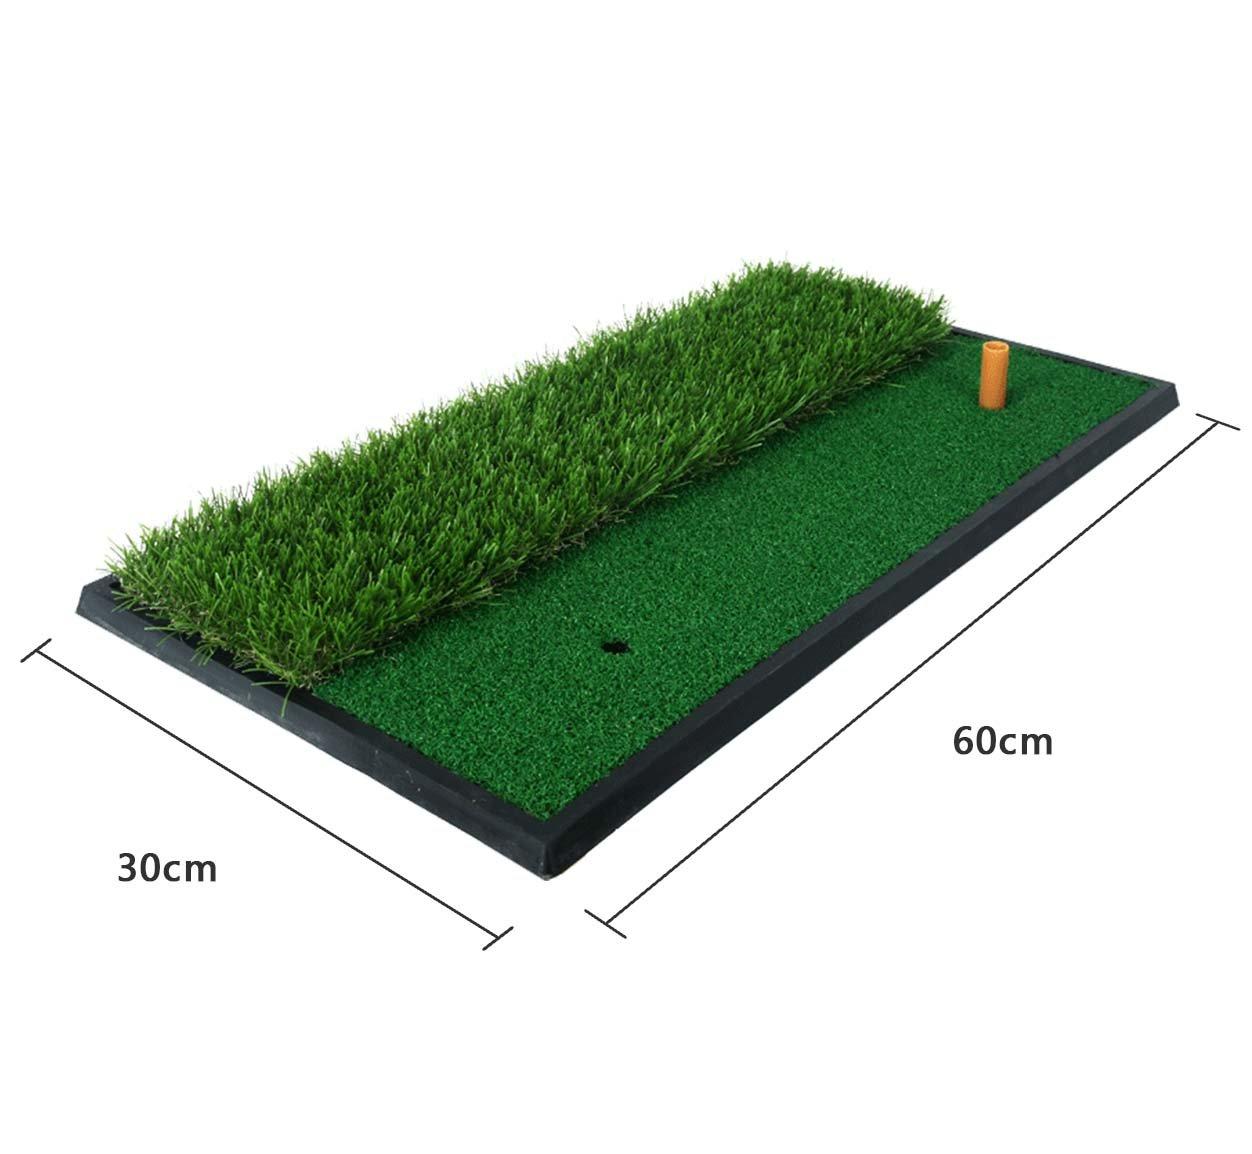 POSMA HM020A 30x60cm Golf Practice Double Side Hit Mat bundle Gift set with 3pcs Rubber Tee + 2pcs Tour Balls + 6pcs Golf Balls + 1pc Portable Golf Chipping Hitting Net for indoor by POSMA (Image #2)